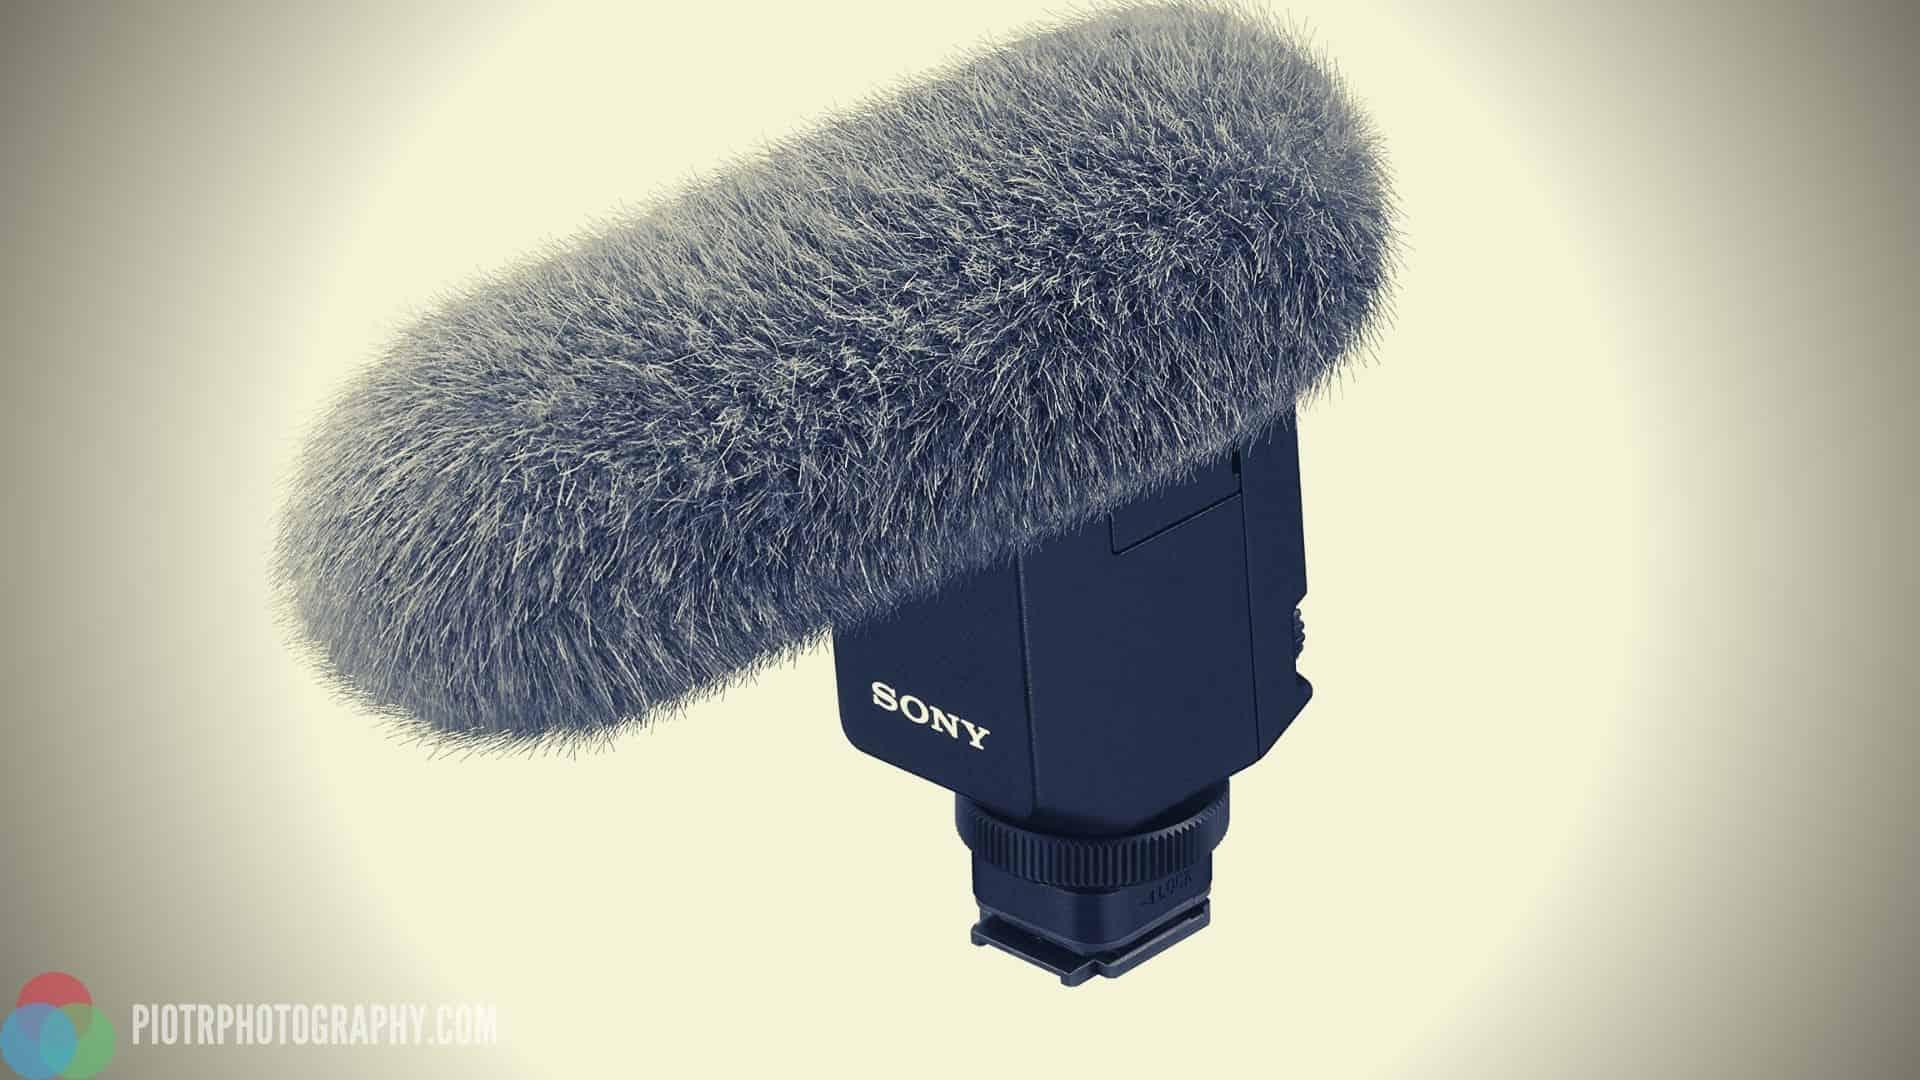 Sony ECM B1M featured